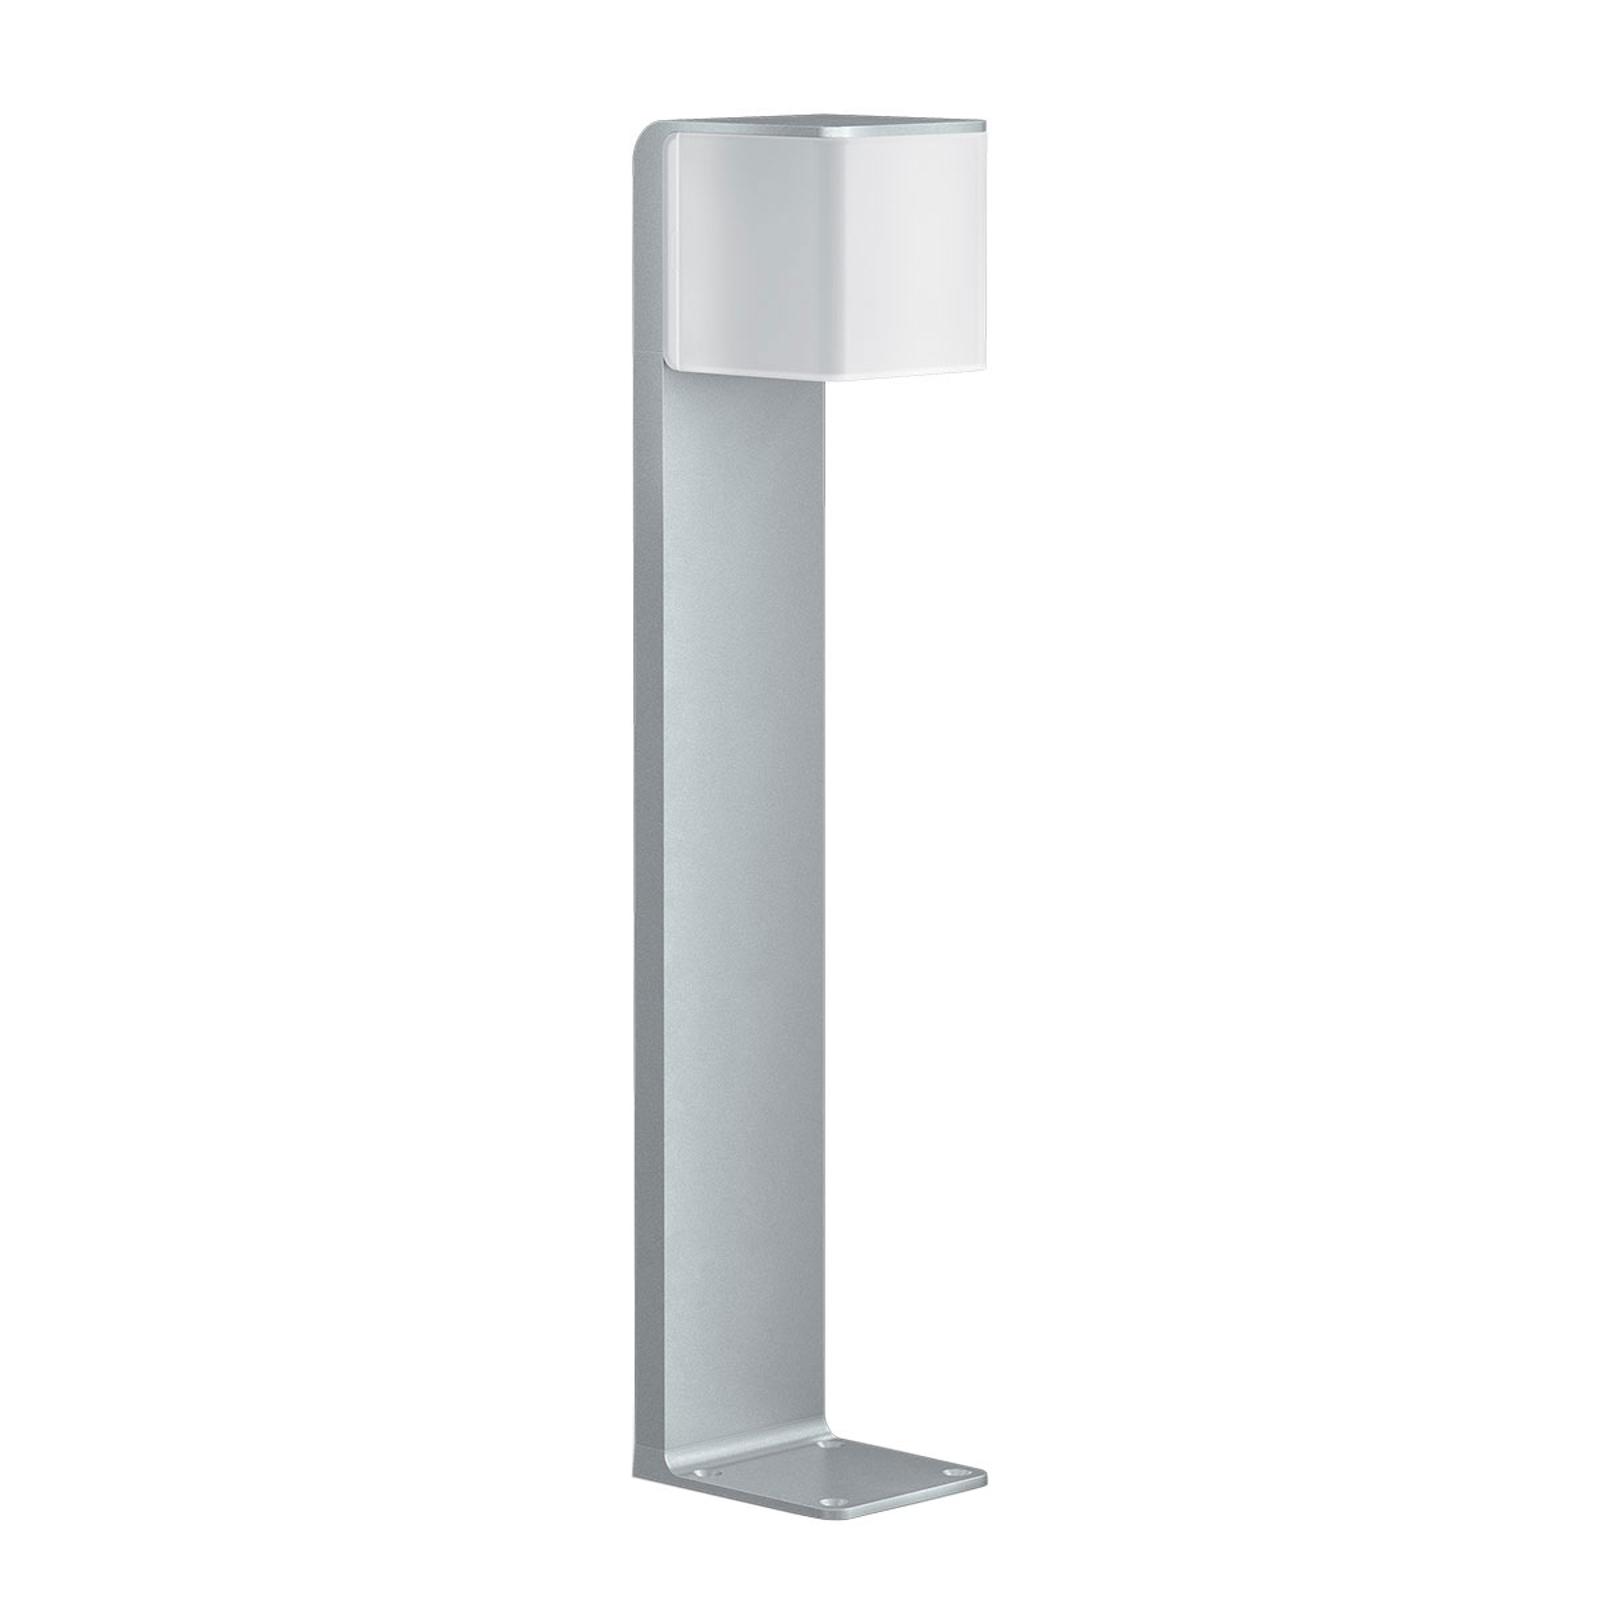 STEINEL GL 80 iHF Cubo lampione sensore argento